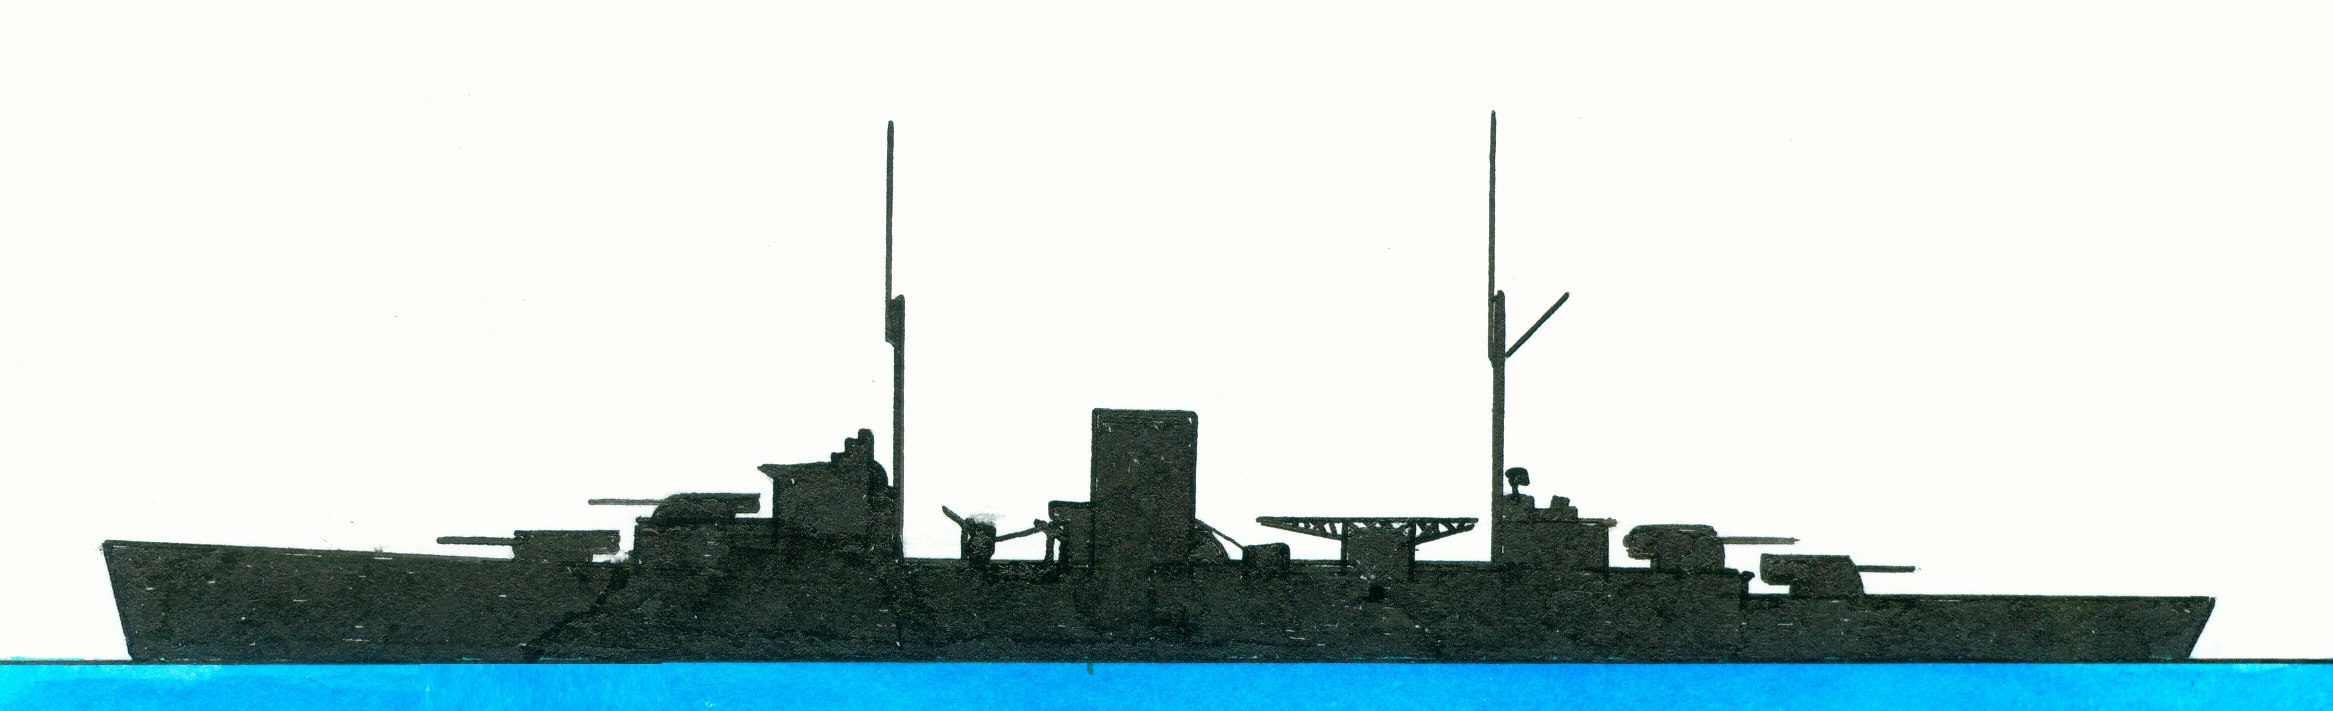 Warshipsresearch  British Light Cruiser Hms Achilles 1931